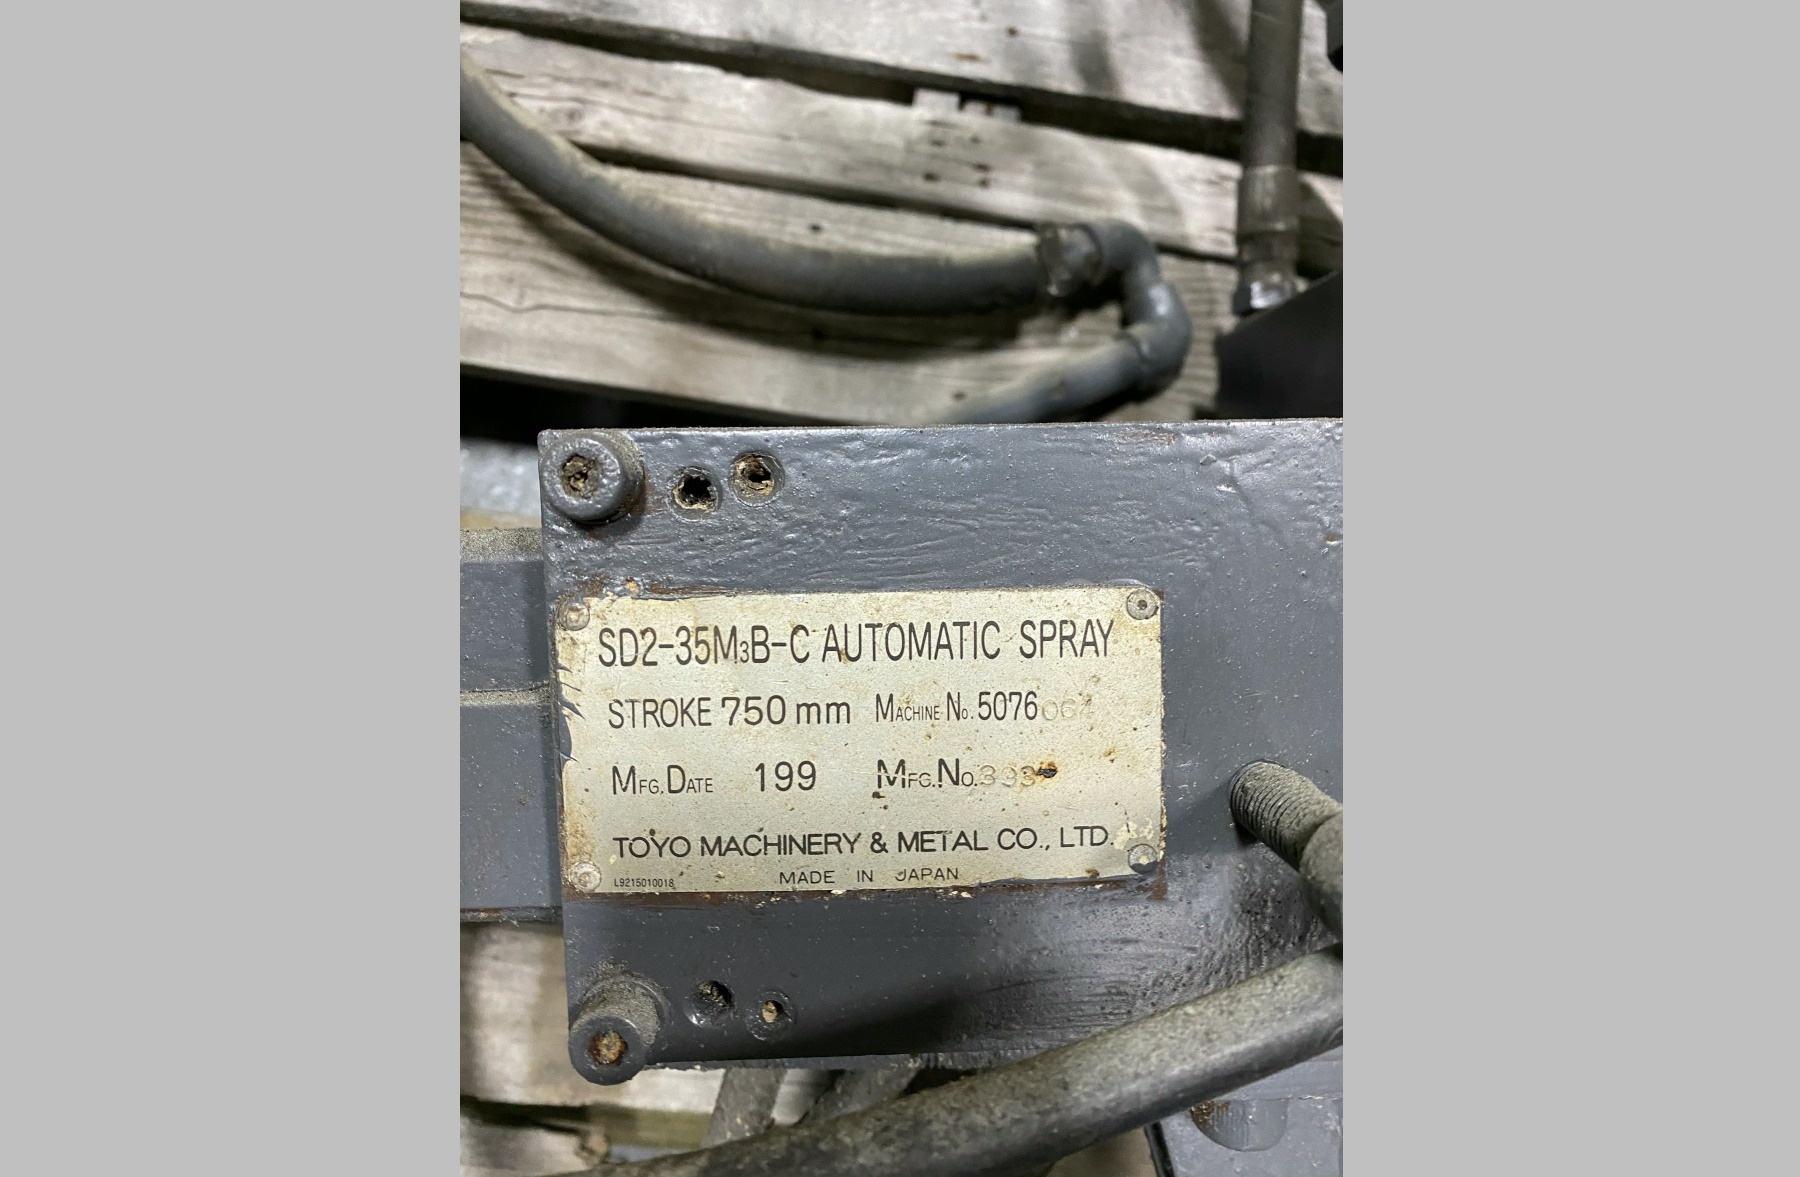 Used Toyo SD2-35M3B-C Sprayer For Die Casting #3982